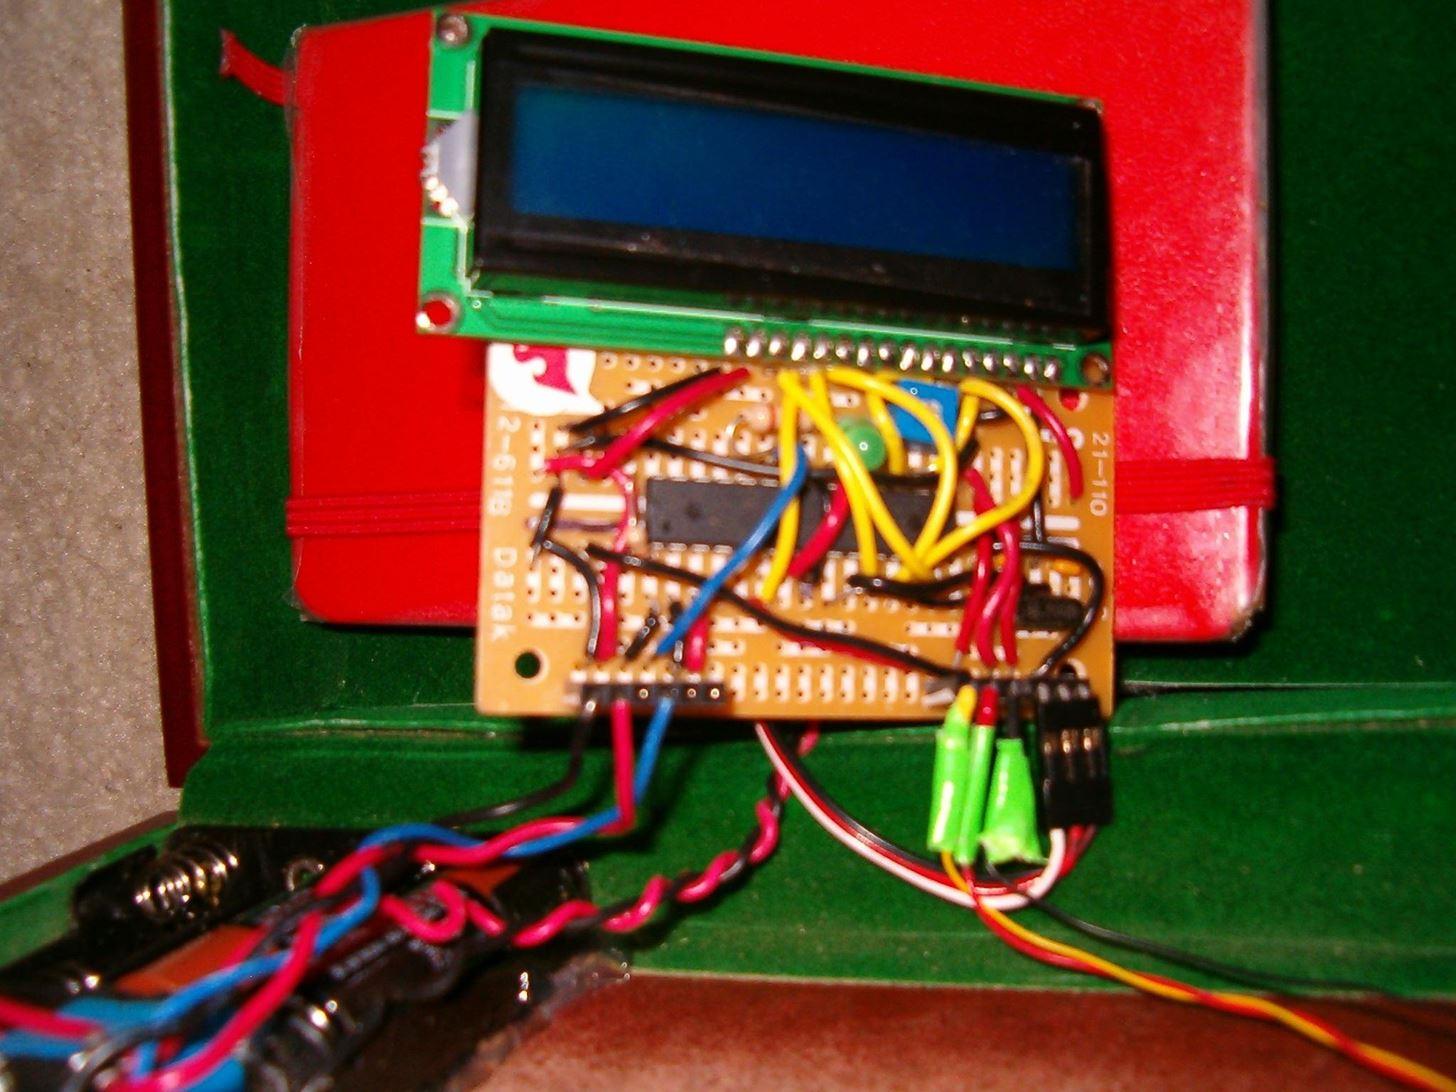 Backwards Geocaching: How to Make a Reverse Geocache Box